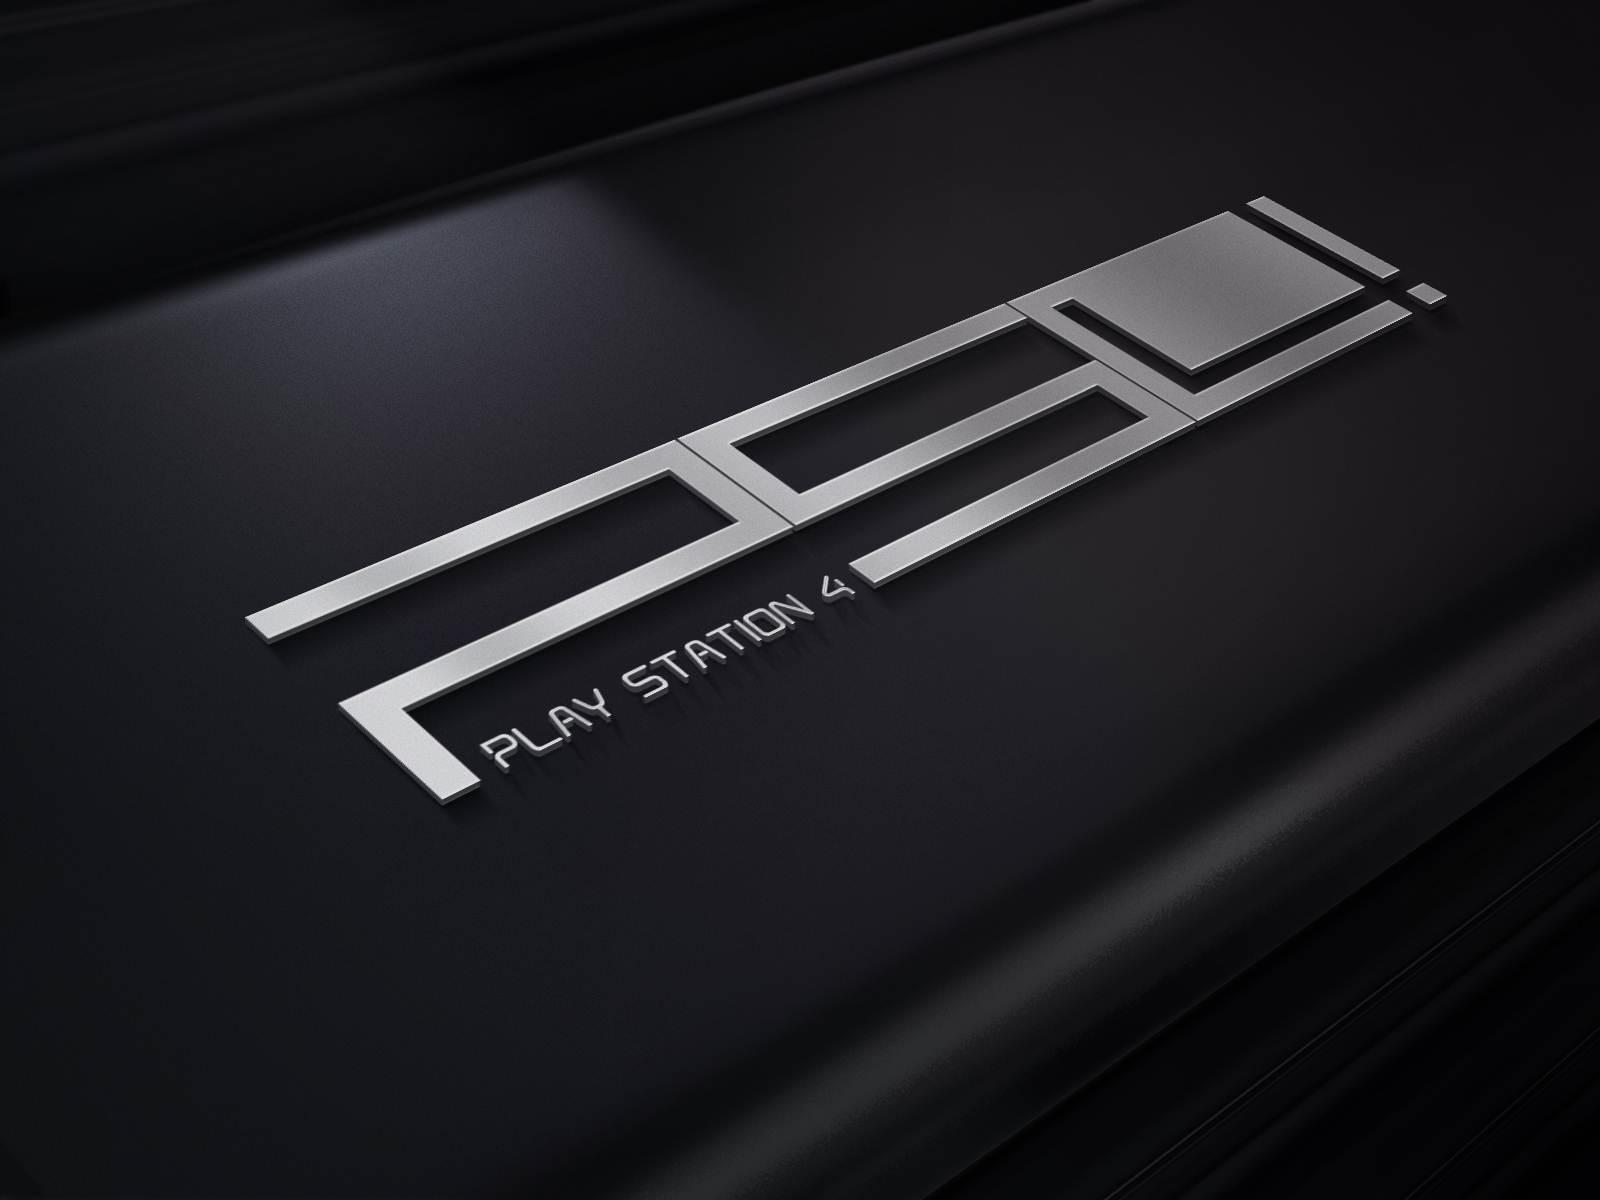 playstation 4 logo 5